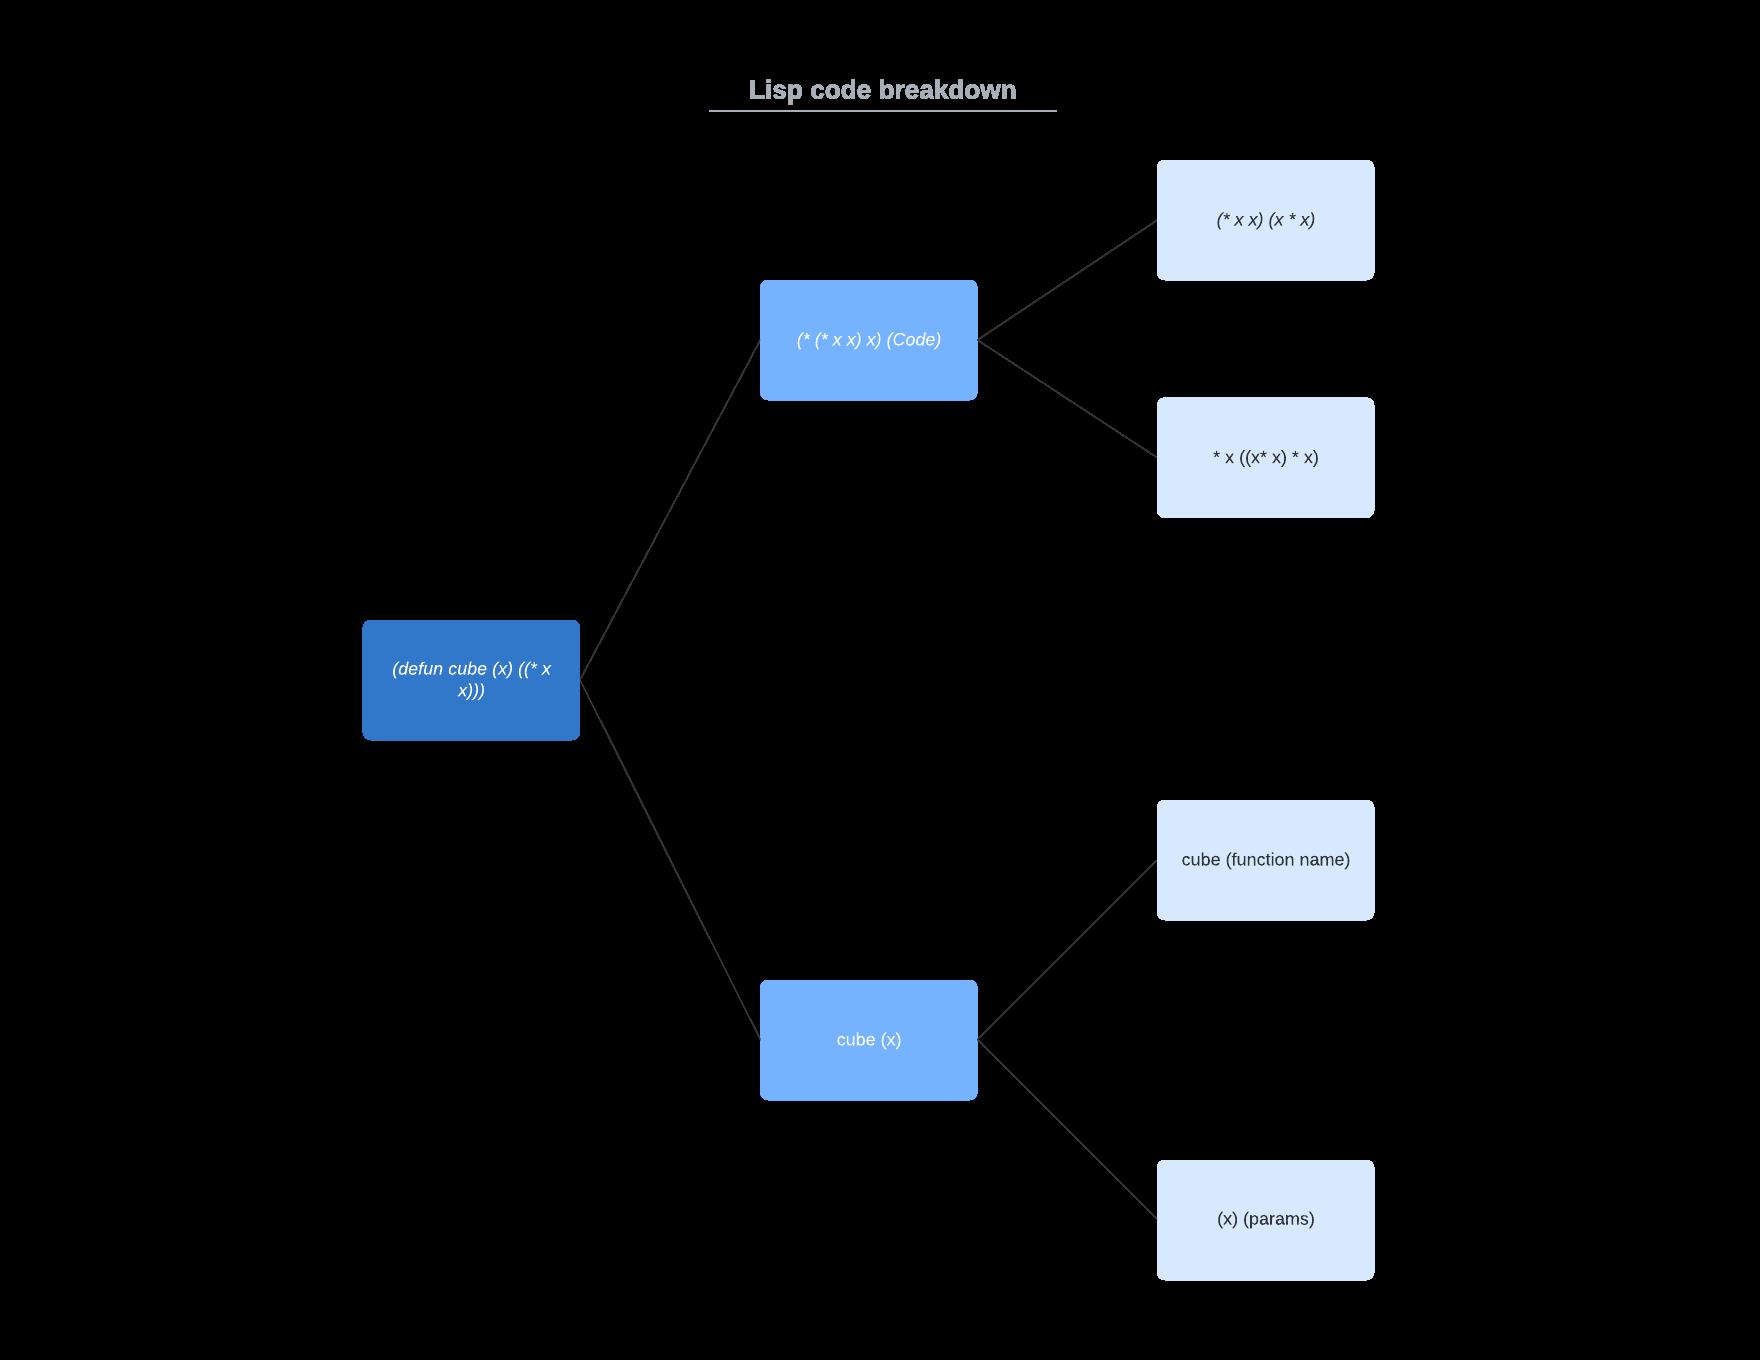 https://cloud-m638vhnj3.vercel.app/0critical-to-quality_tree.png